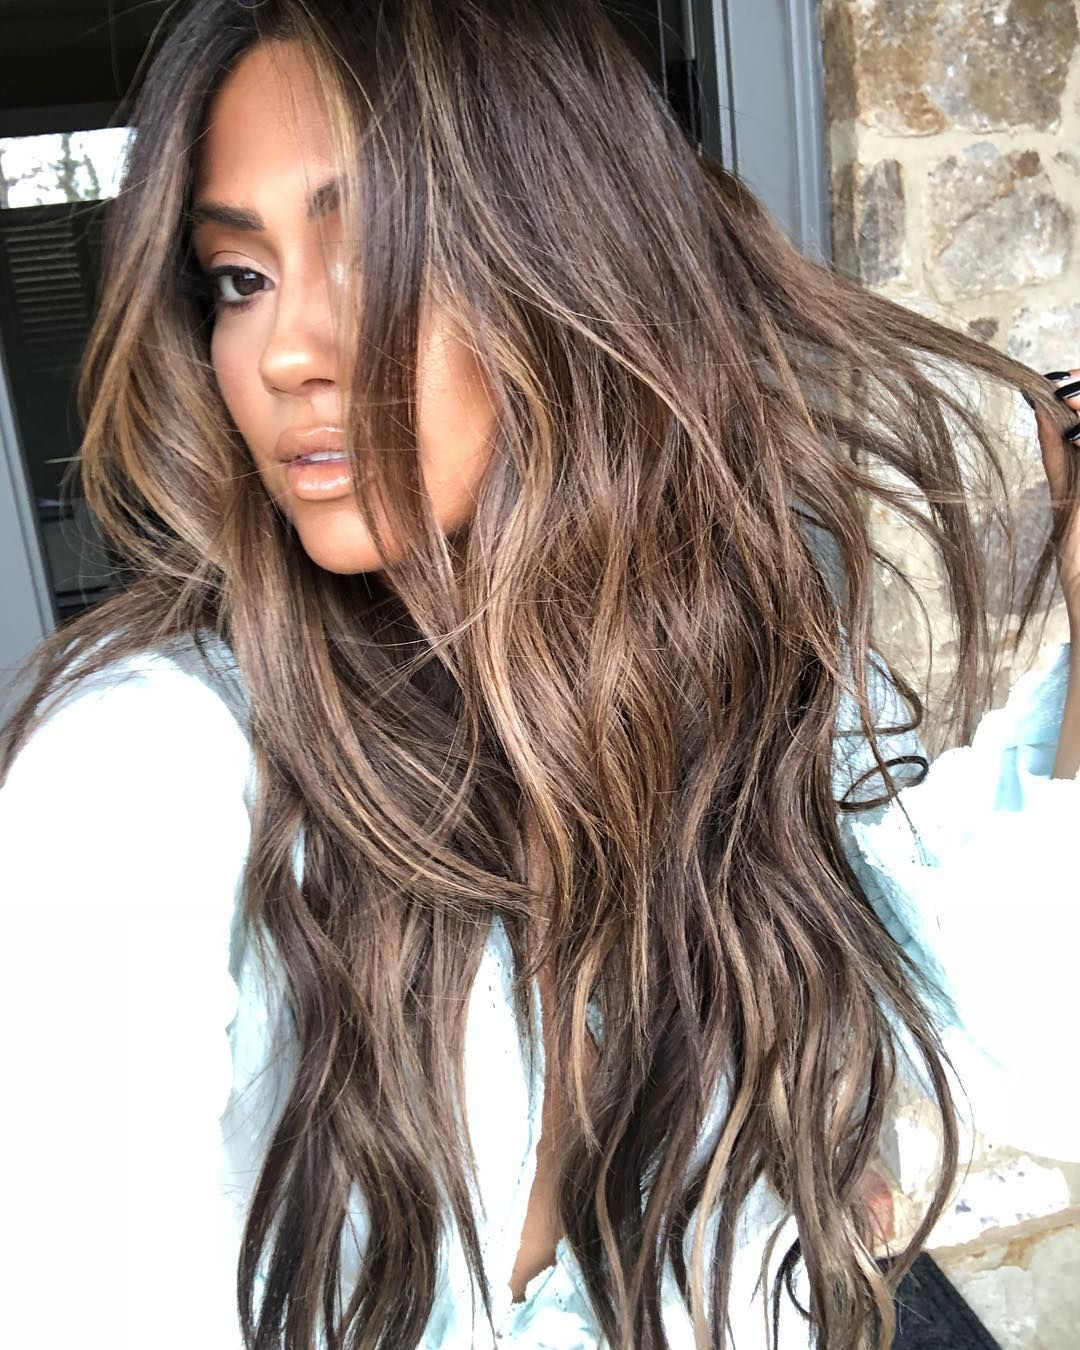 Hair Inspiration 2019-04-06 16:12:27